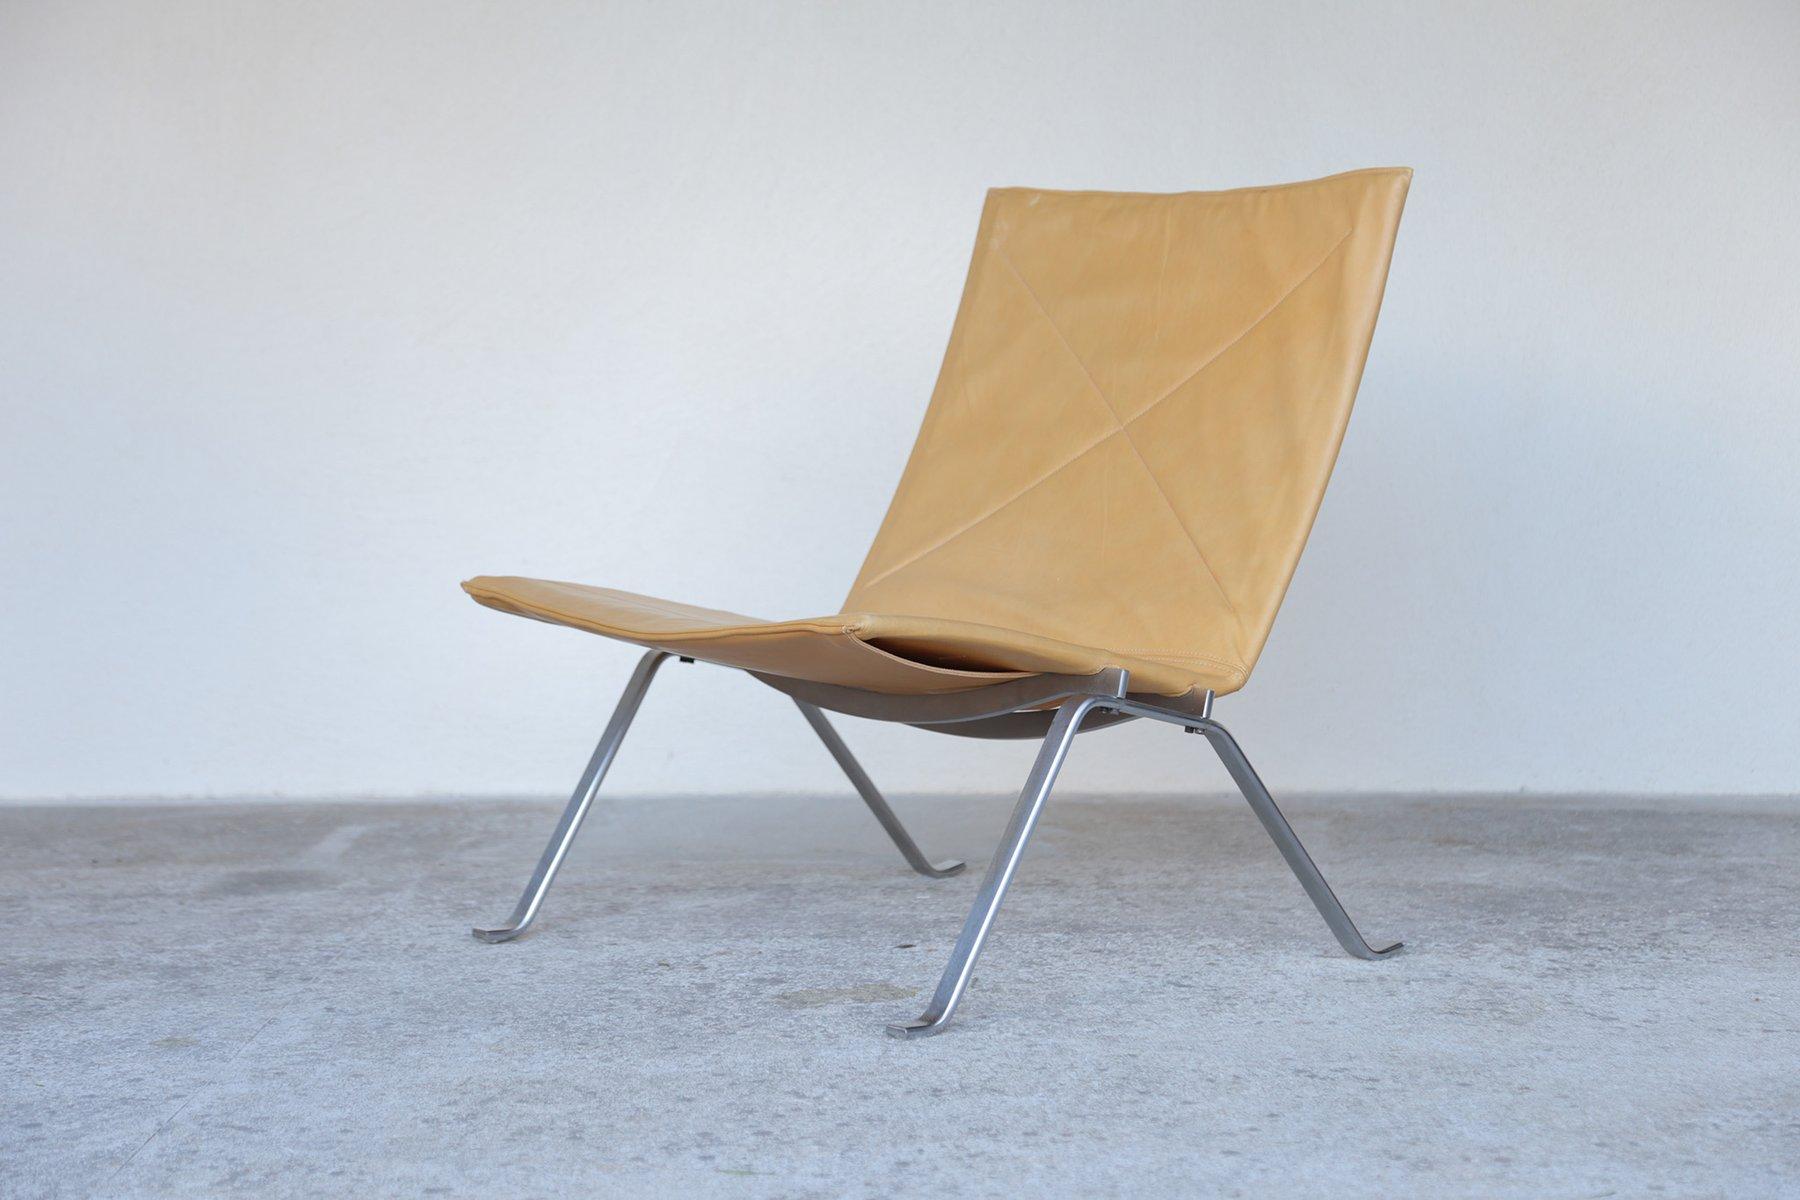 PK22 Easy Chair by Poul Kjaerholm for E Kold Christensen for sale at Pamono